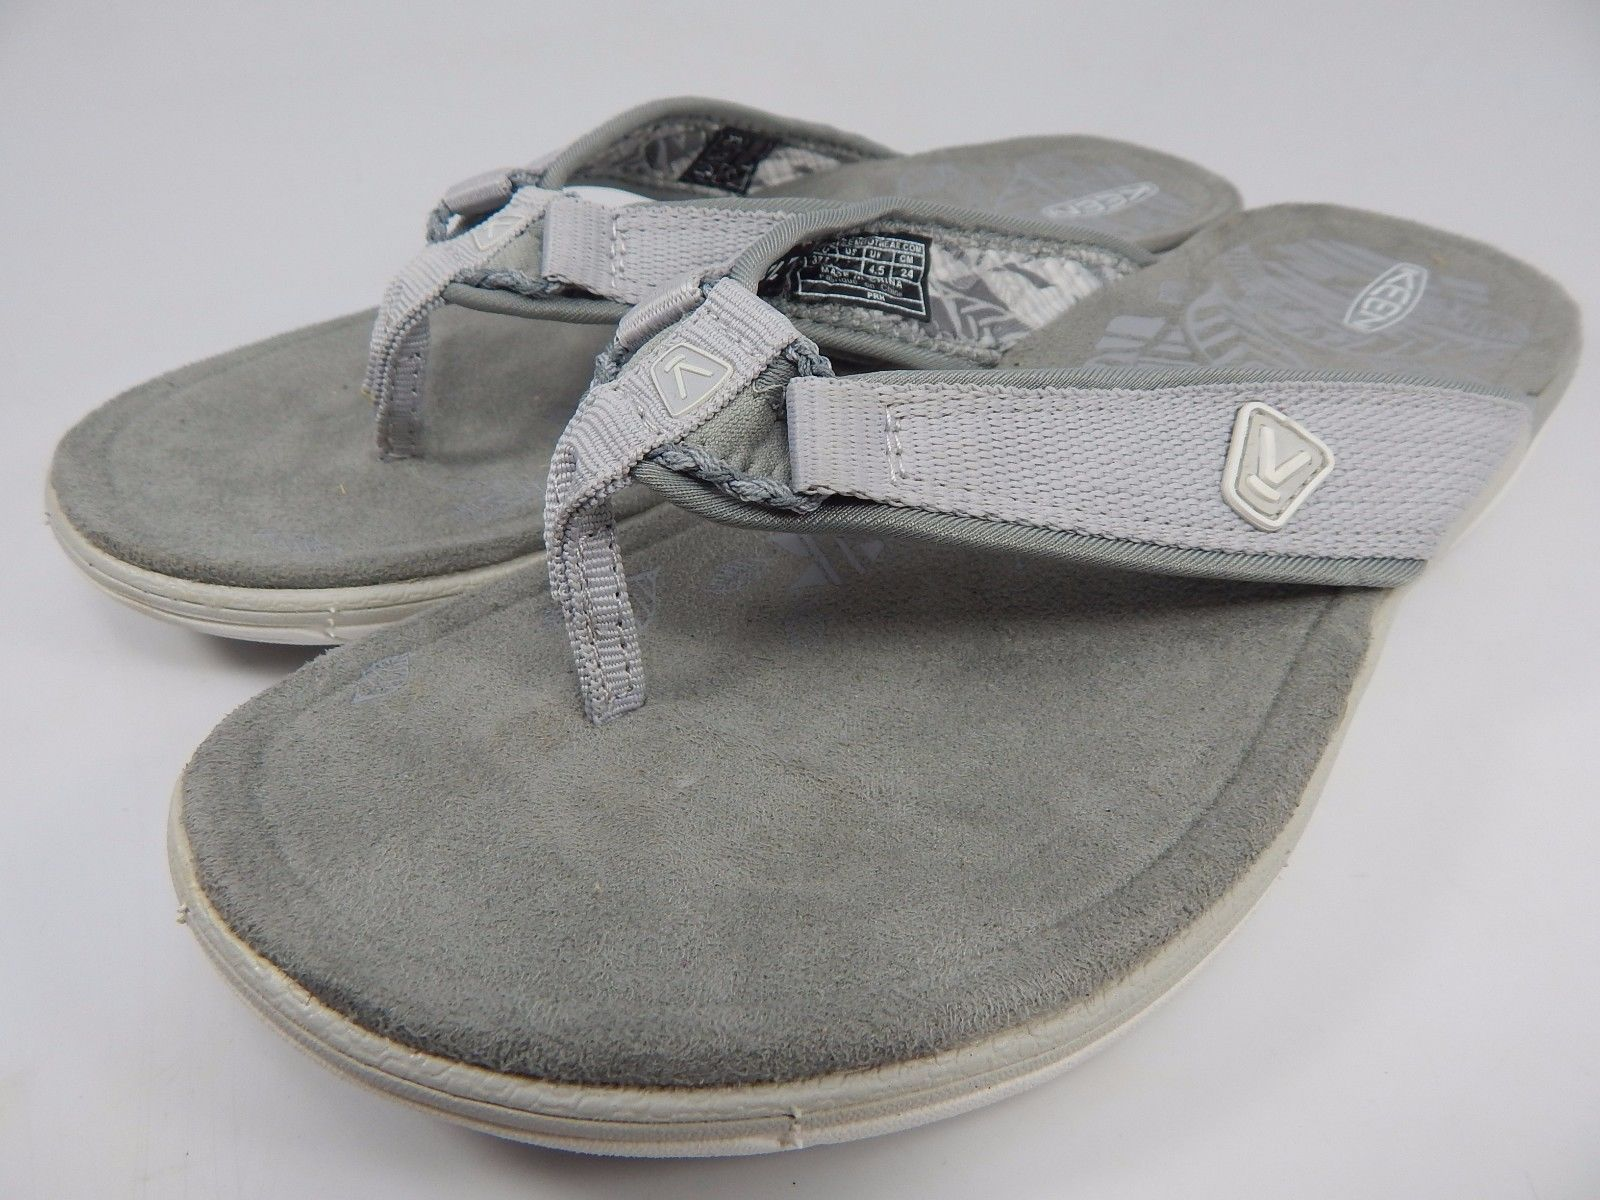 Keen Maya Flip Women's Sports Sandals Sz US 7 M (B) EU 37.5 Gray Scale